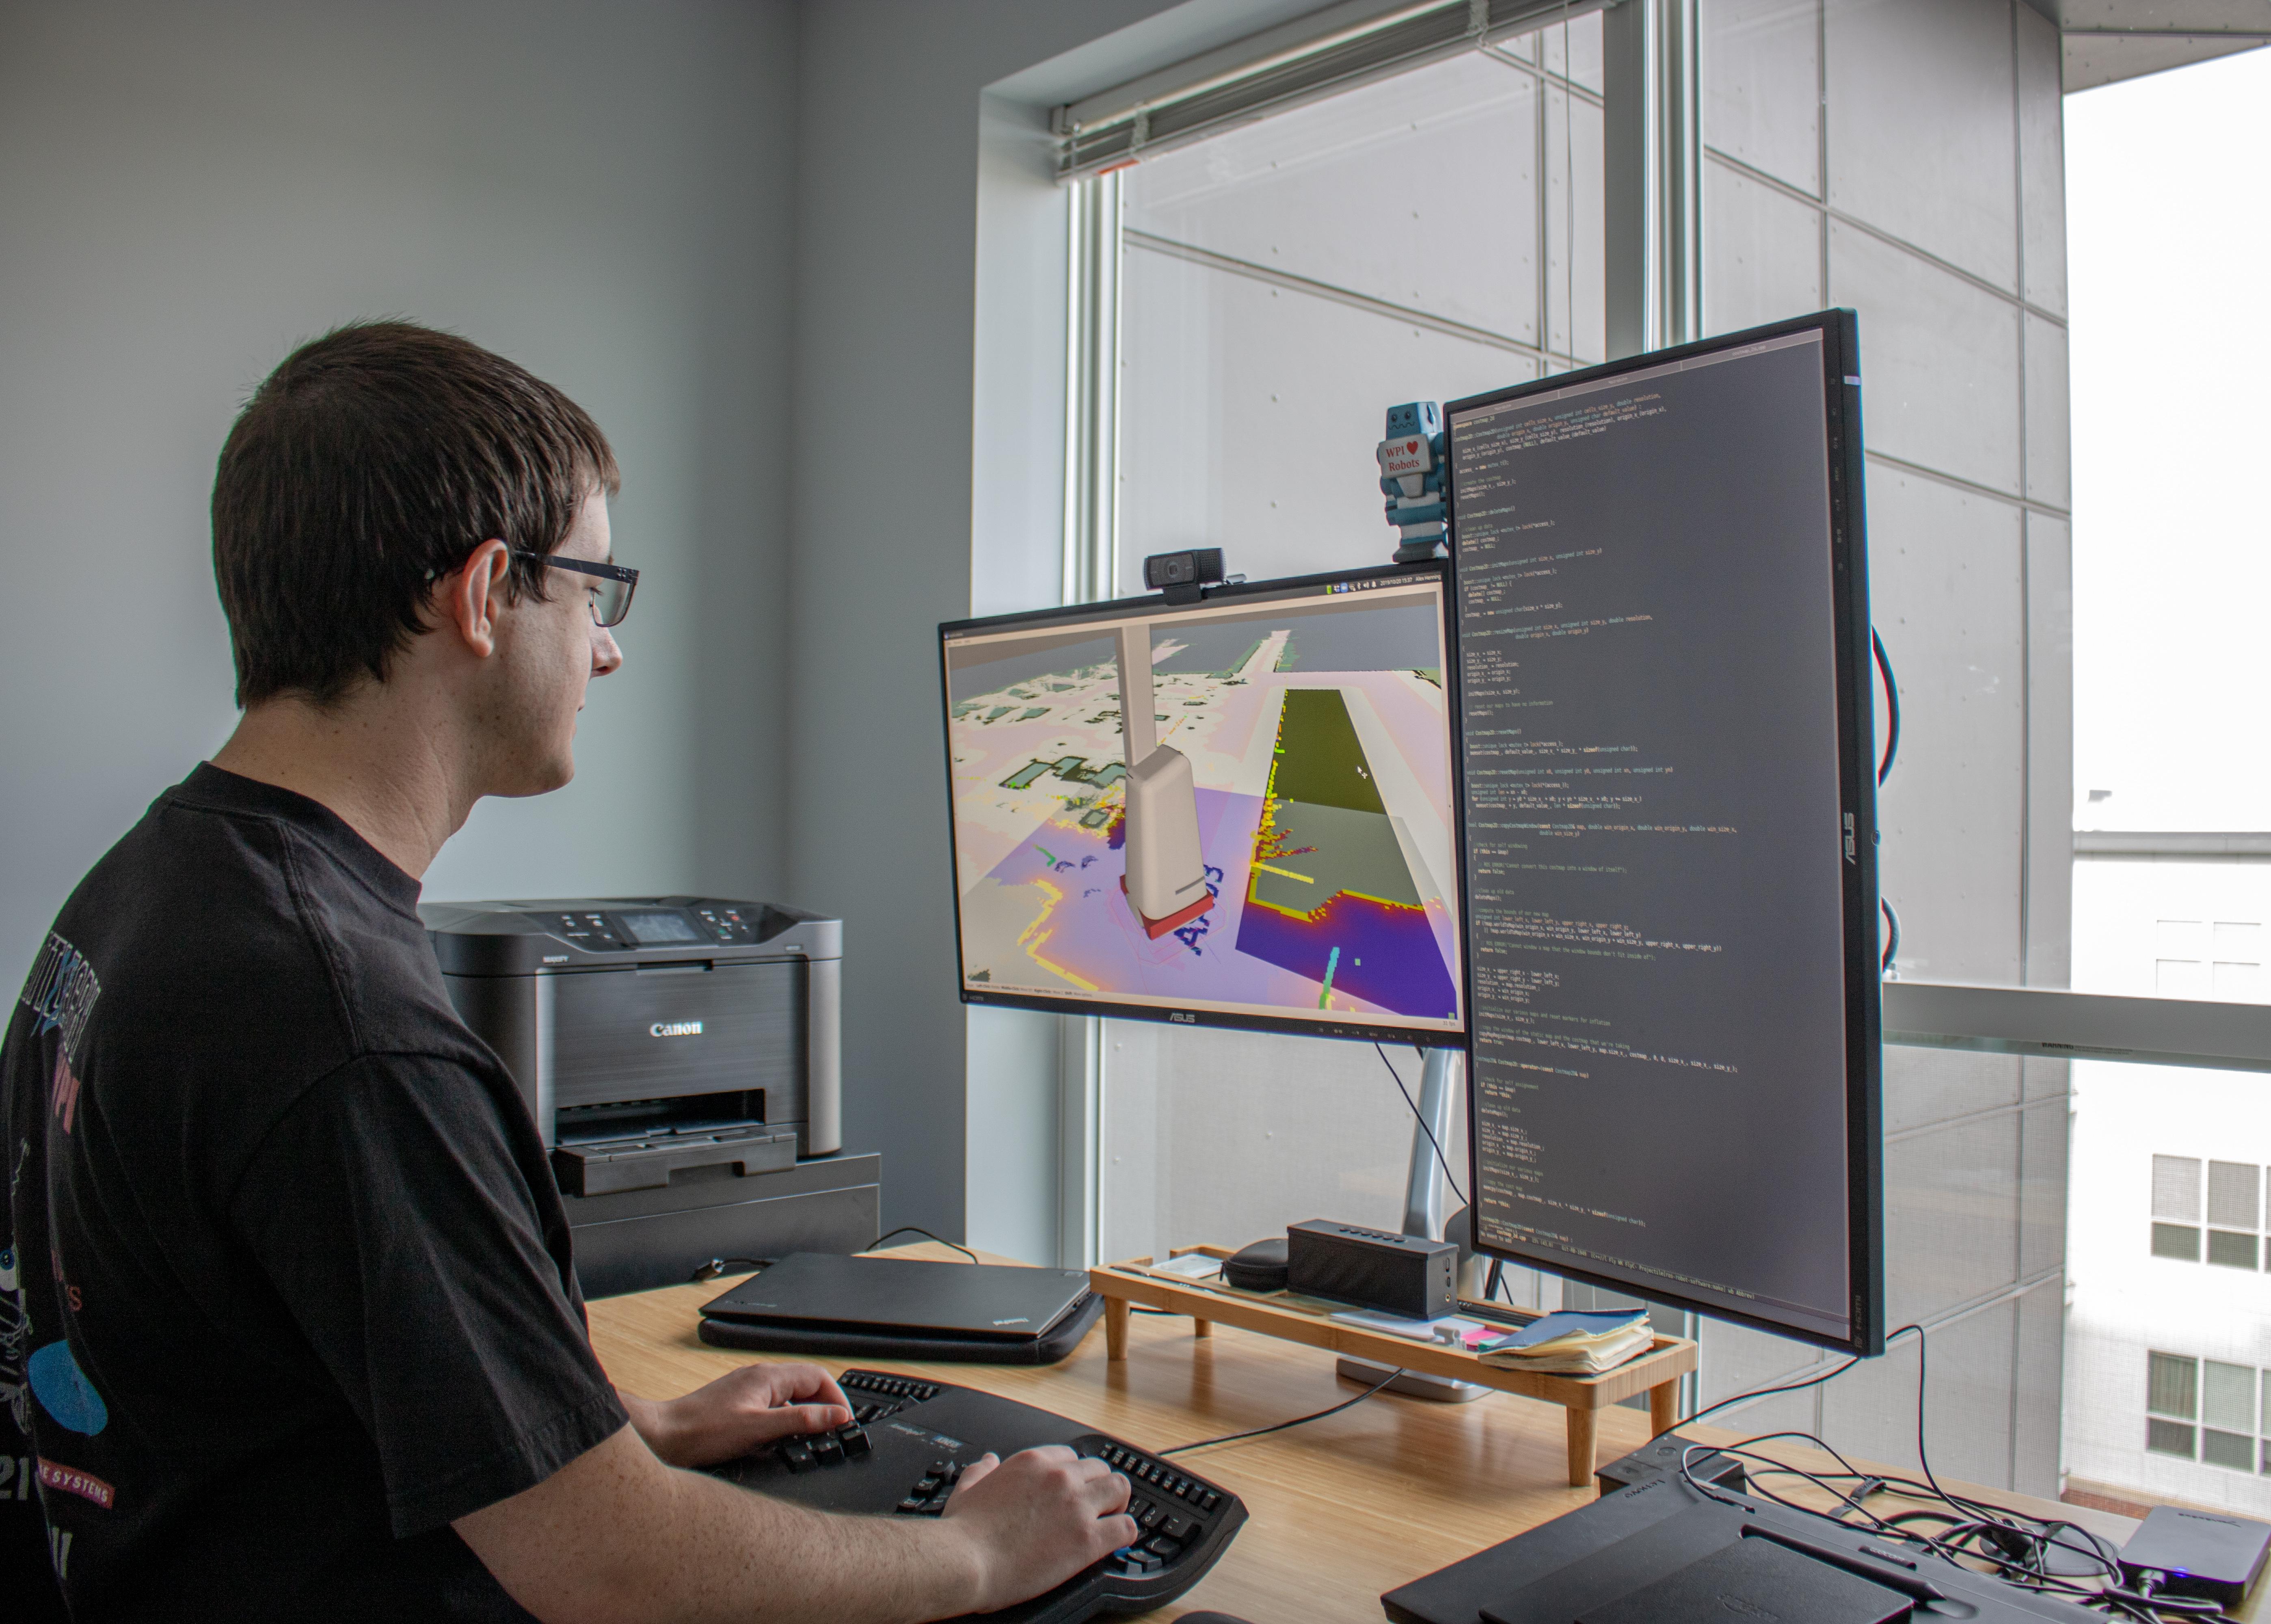 A former Robotics Engineering major working on his computer